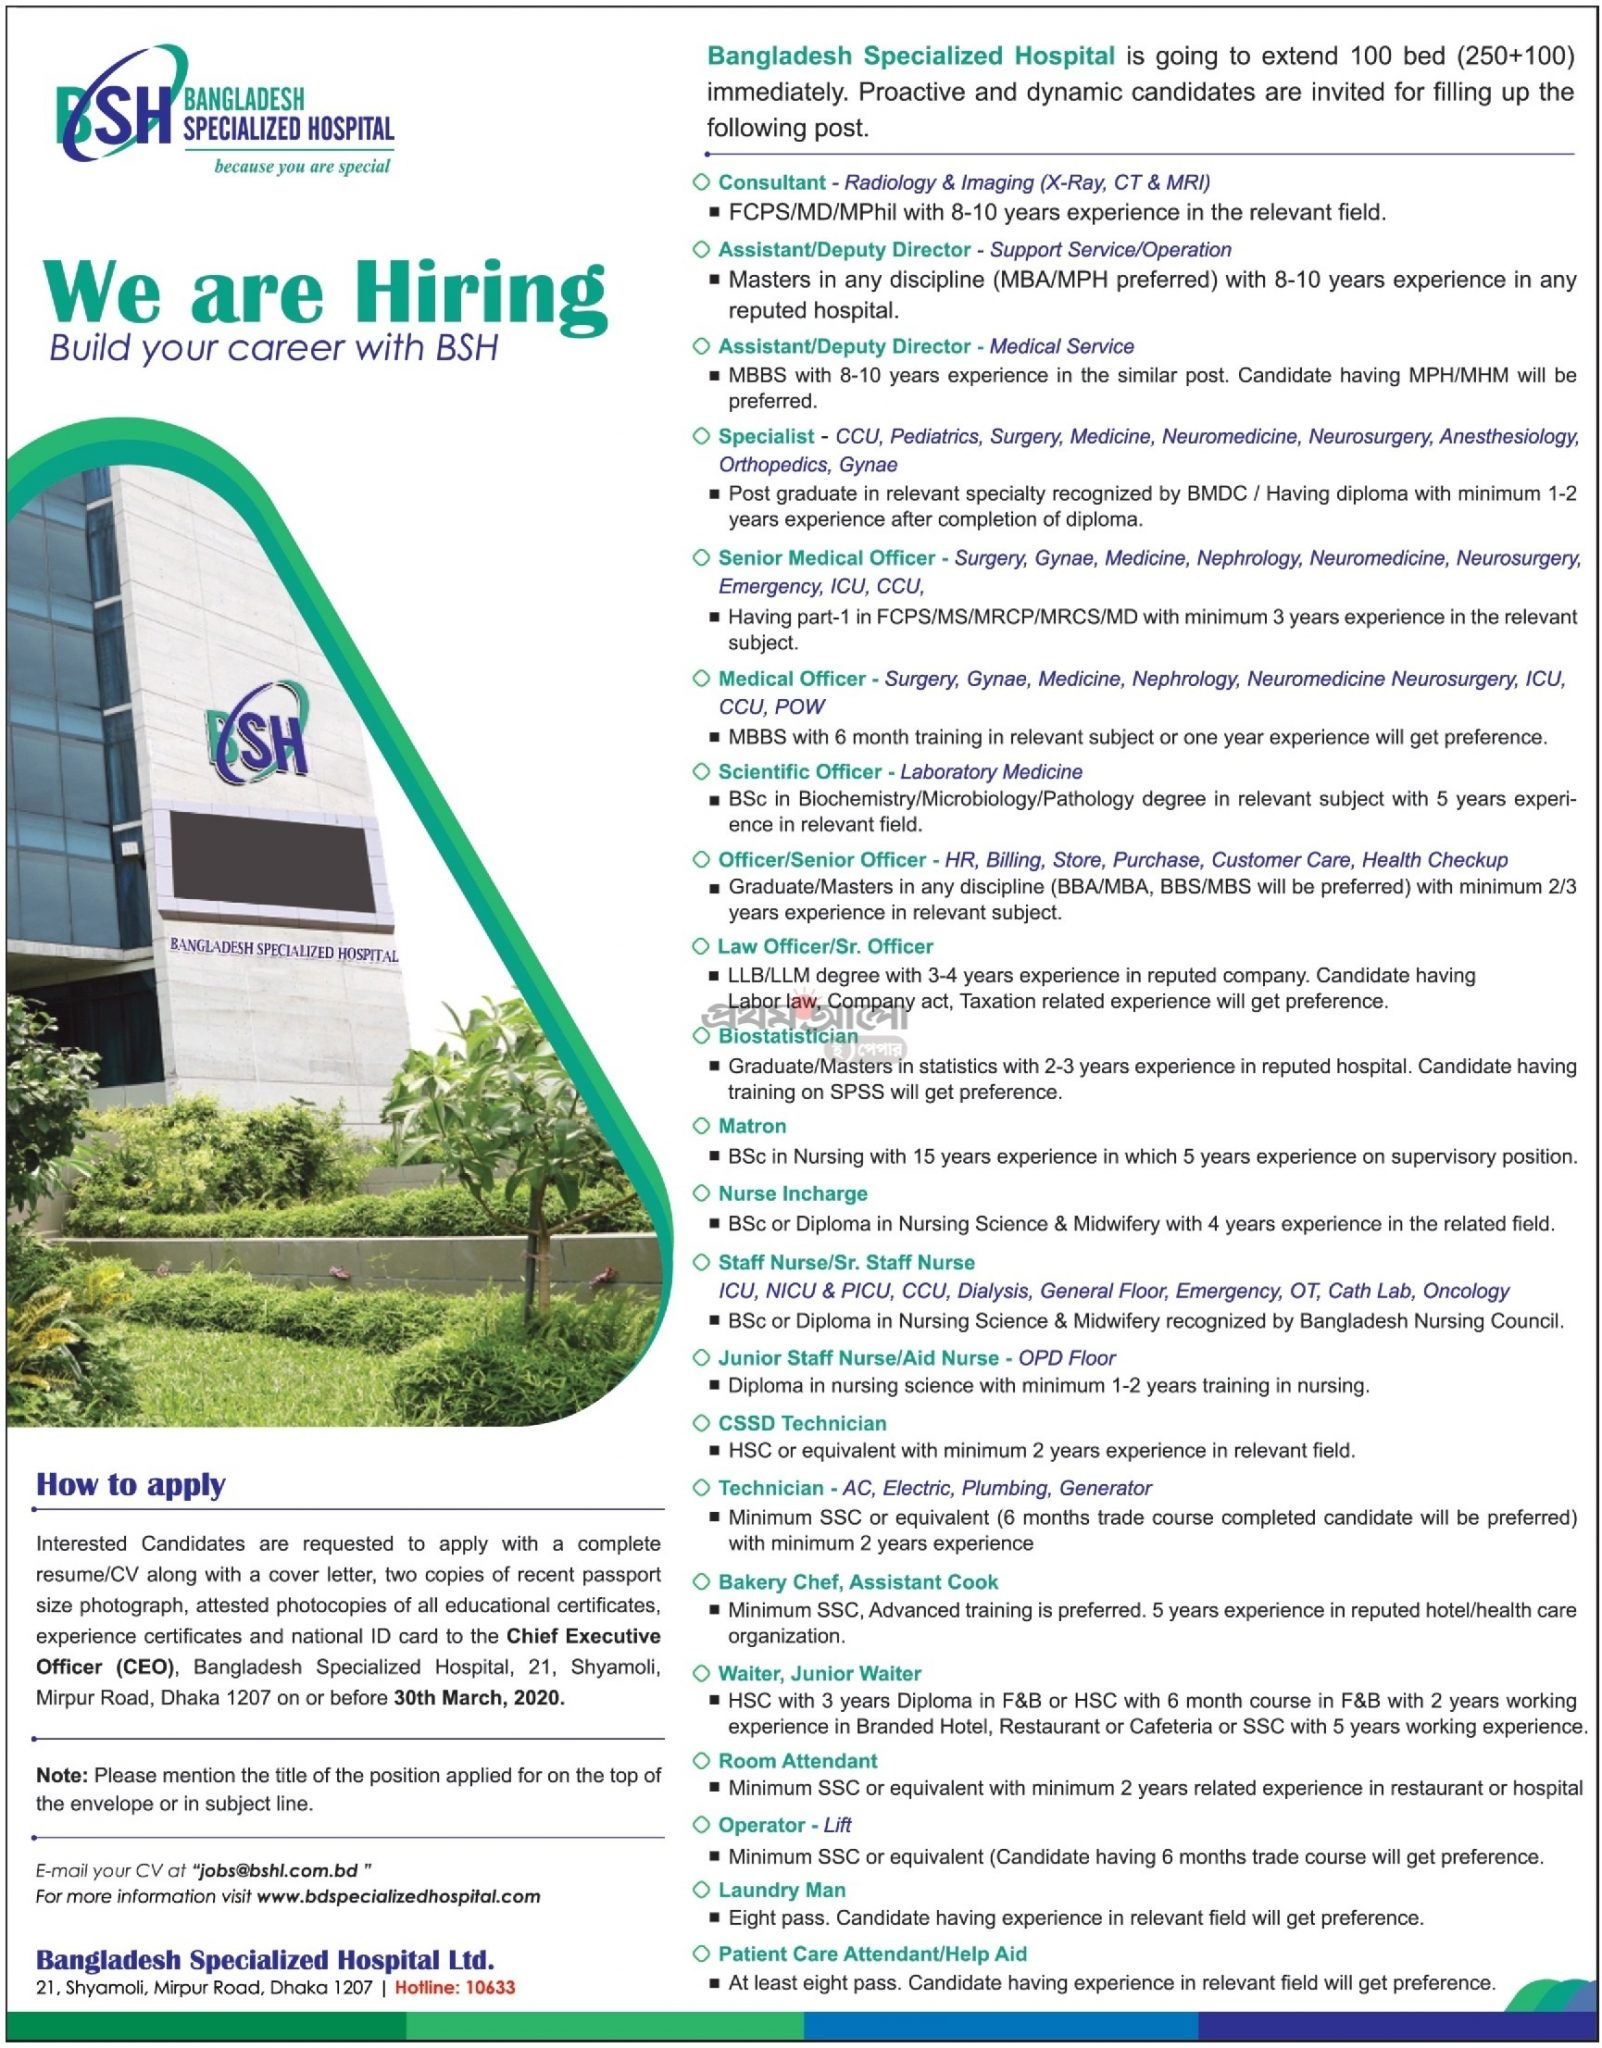 Bangladesh Specialized Hospital Limited Job Circular 2020